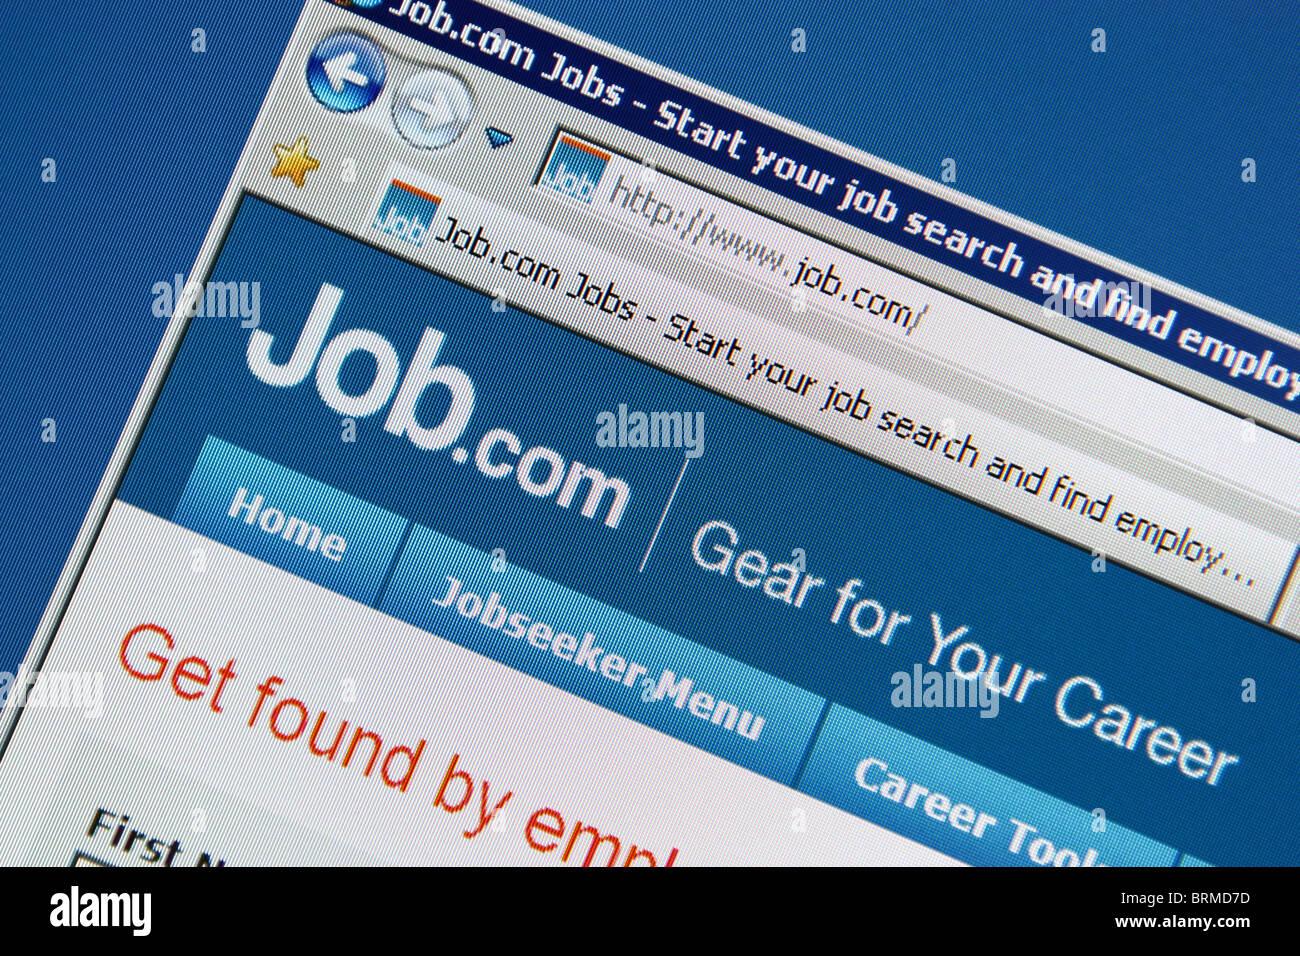 online job search website job.com - Stock Image